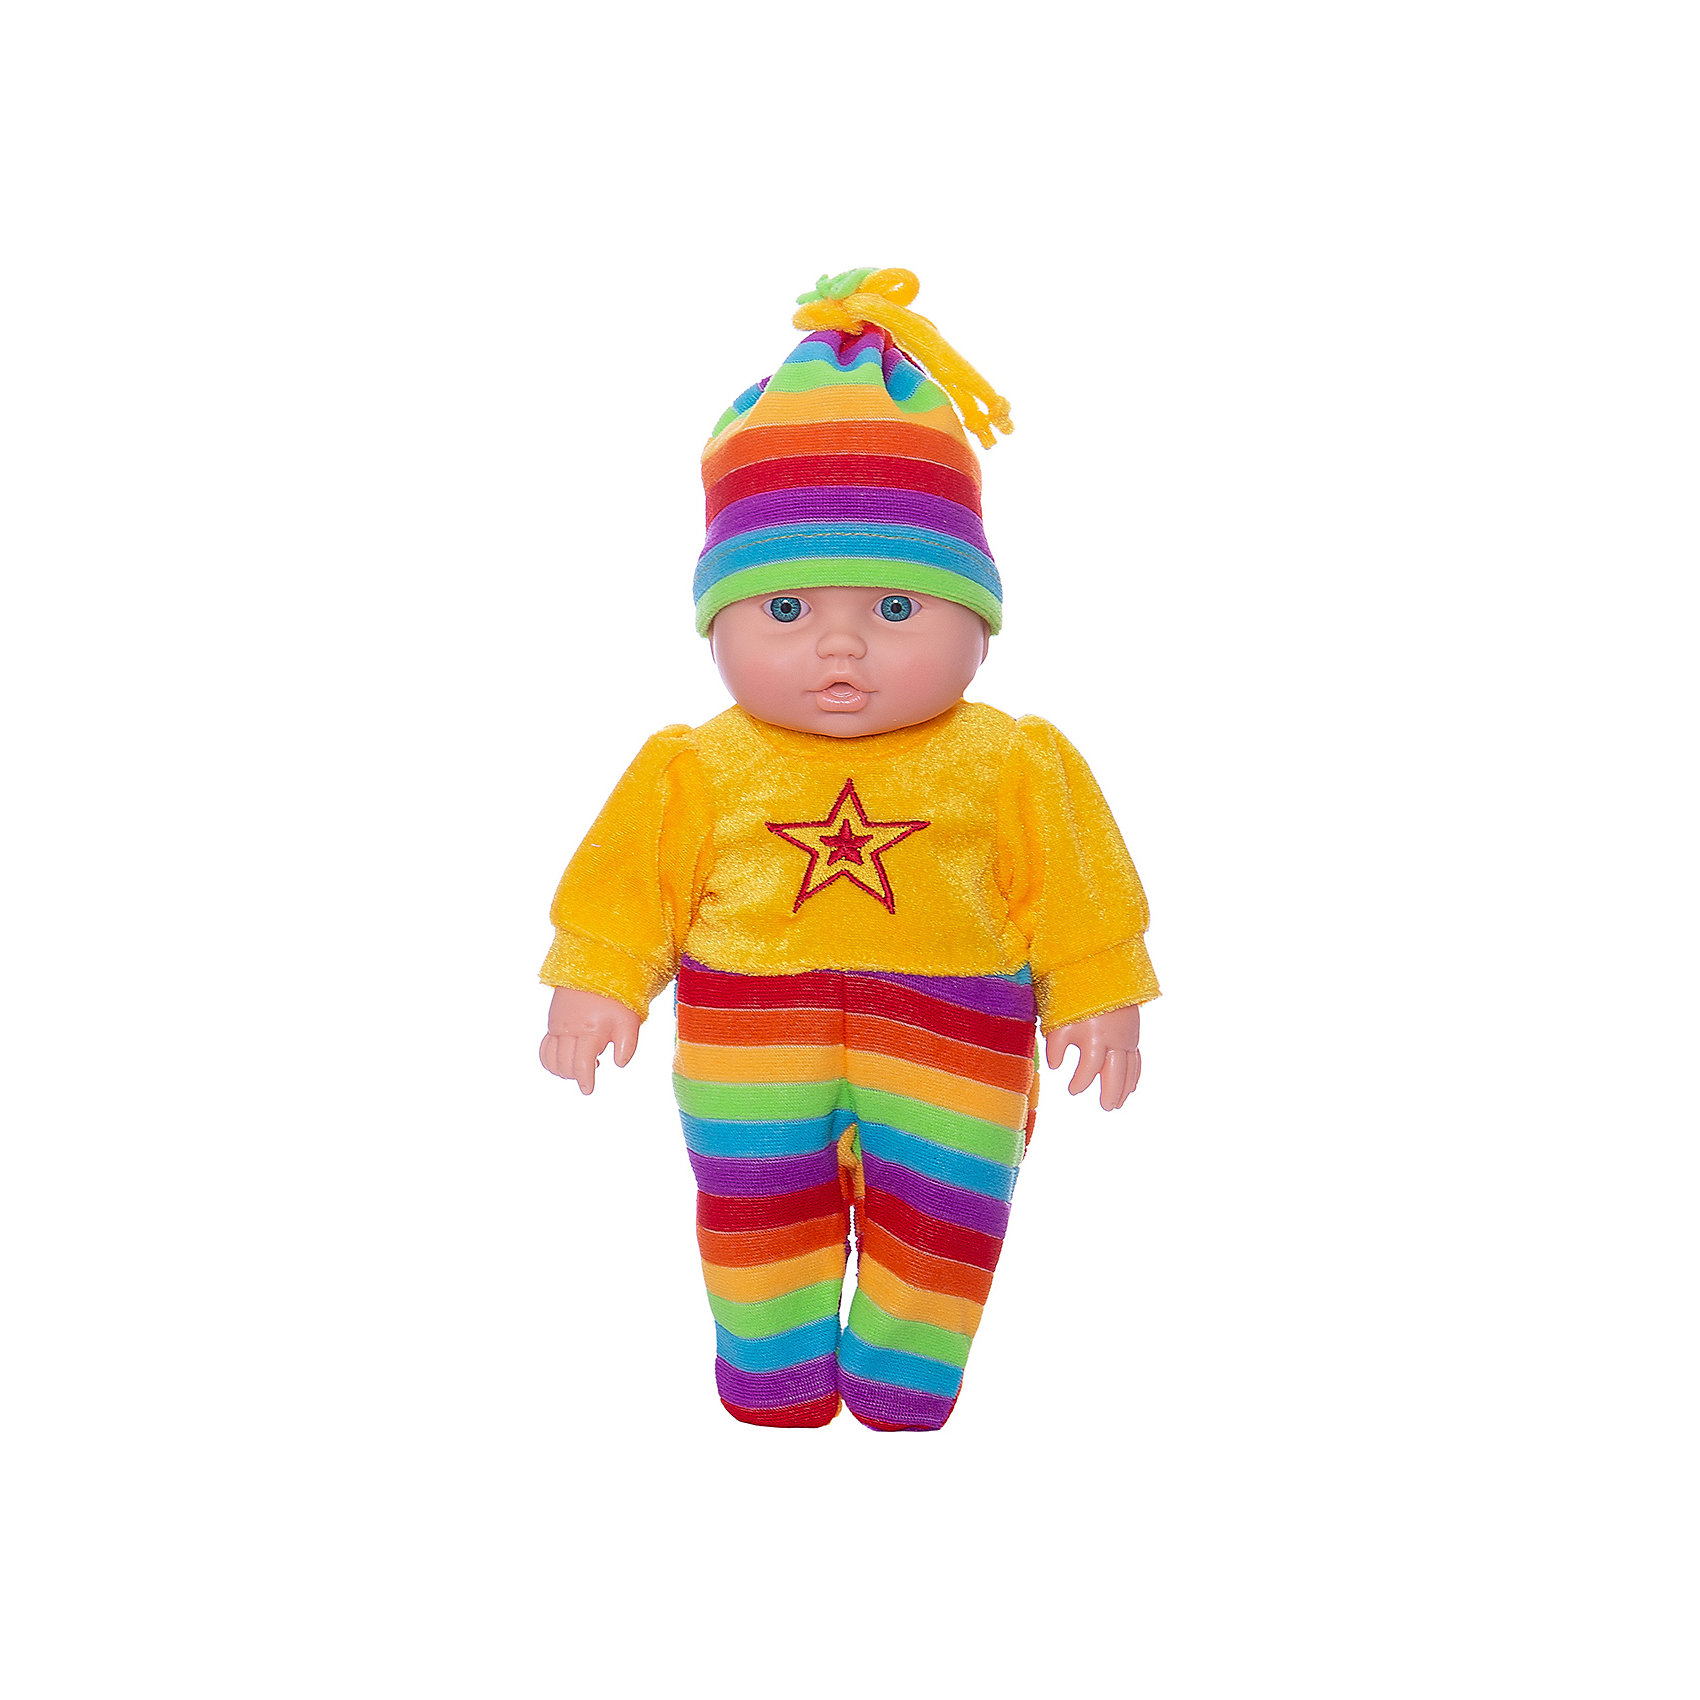 Кукла Малыш 4 (мальчик), 31 см, ВеснаКлассические куклы<br><br><br>Ширина мм: 335<br>Глубина мм: 350<br>Высота мм: 205<br>Вес г: 460<br>Возраст от месяцев: 36<br>Возраст до месяцев: 144<br>Пол: Женский<br>Возраст: Детский<br>SKU: 4896499